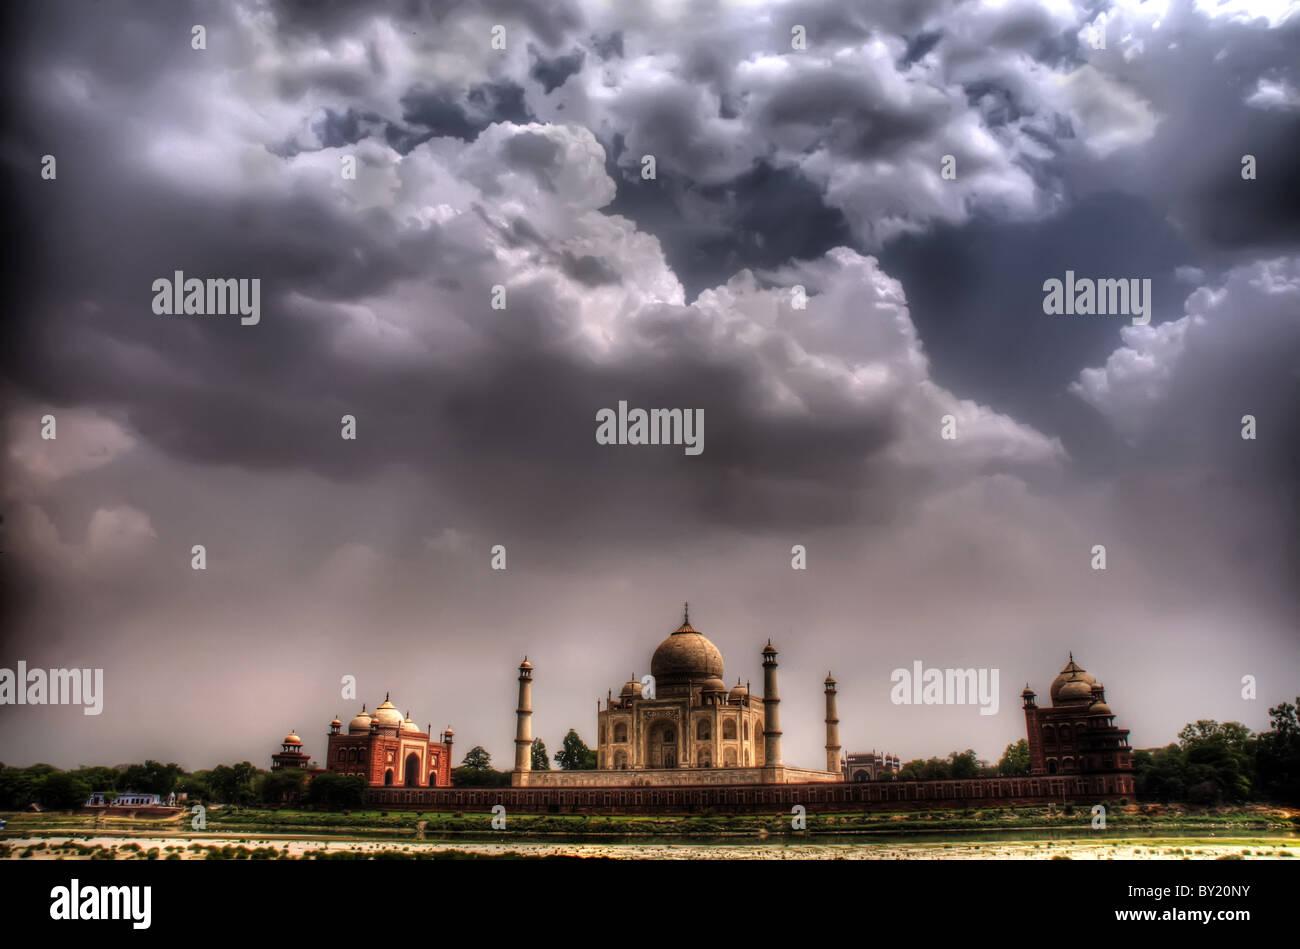 A gathering storm over The Taj Mahal - Stock Image